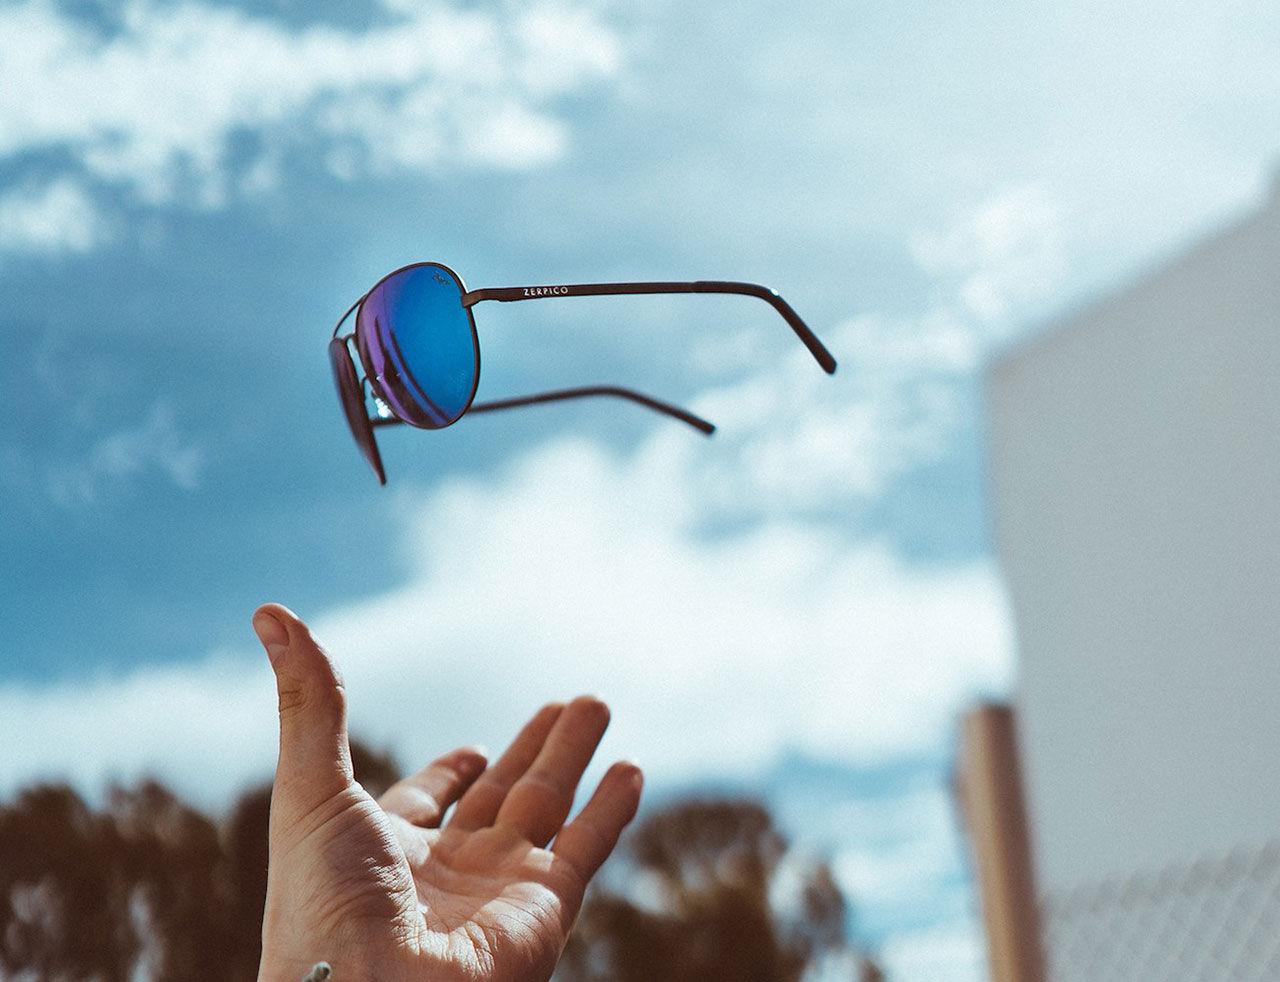 Ny solglasögonmodell från svenska Zerpico